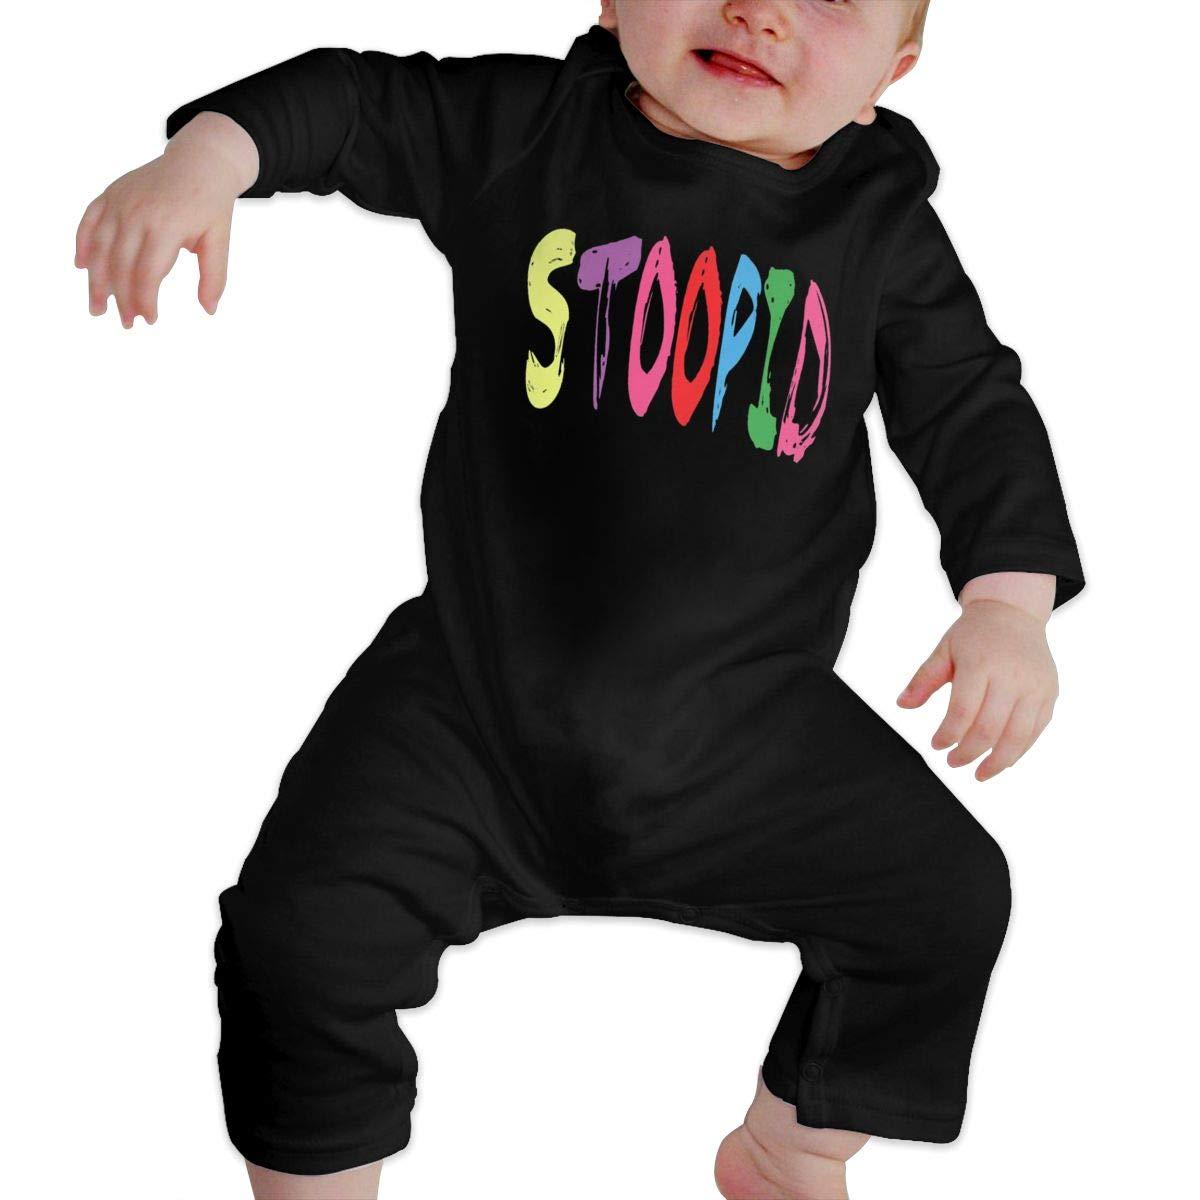 Fional Infant Long Sleeve Romper Stoopid?Rainbow Newborn Babys 0-24M Organic Cotton Jumpsuit Outfit